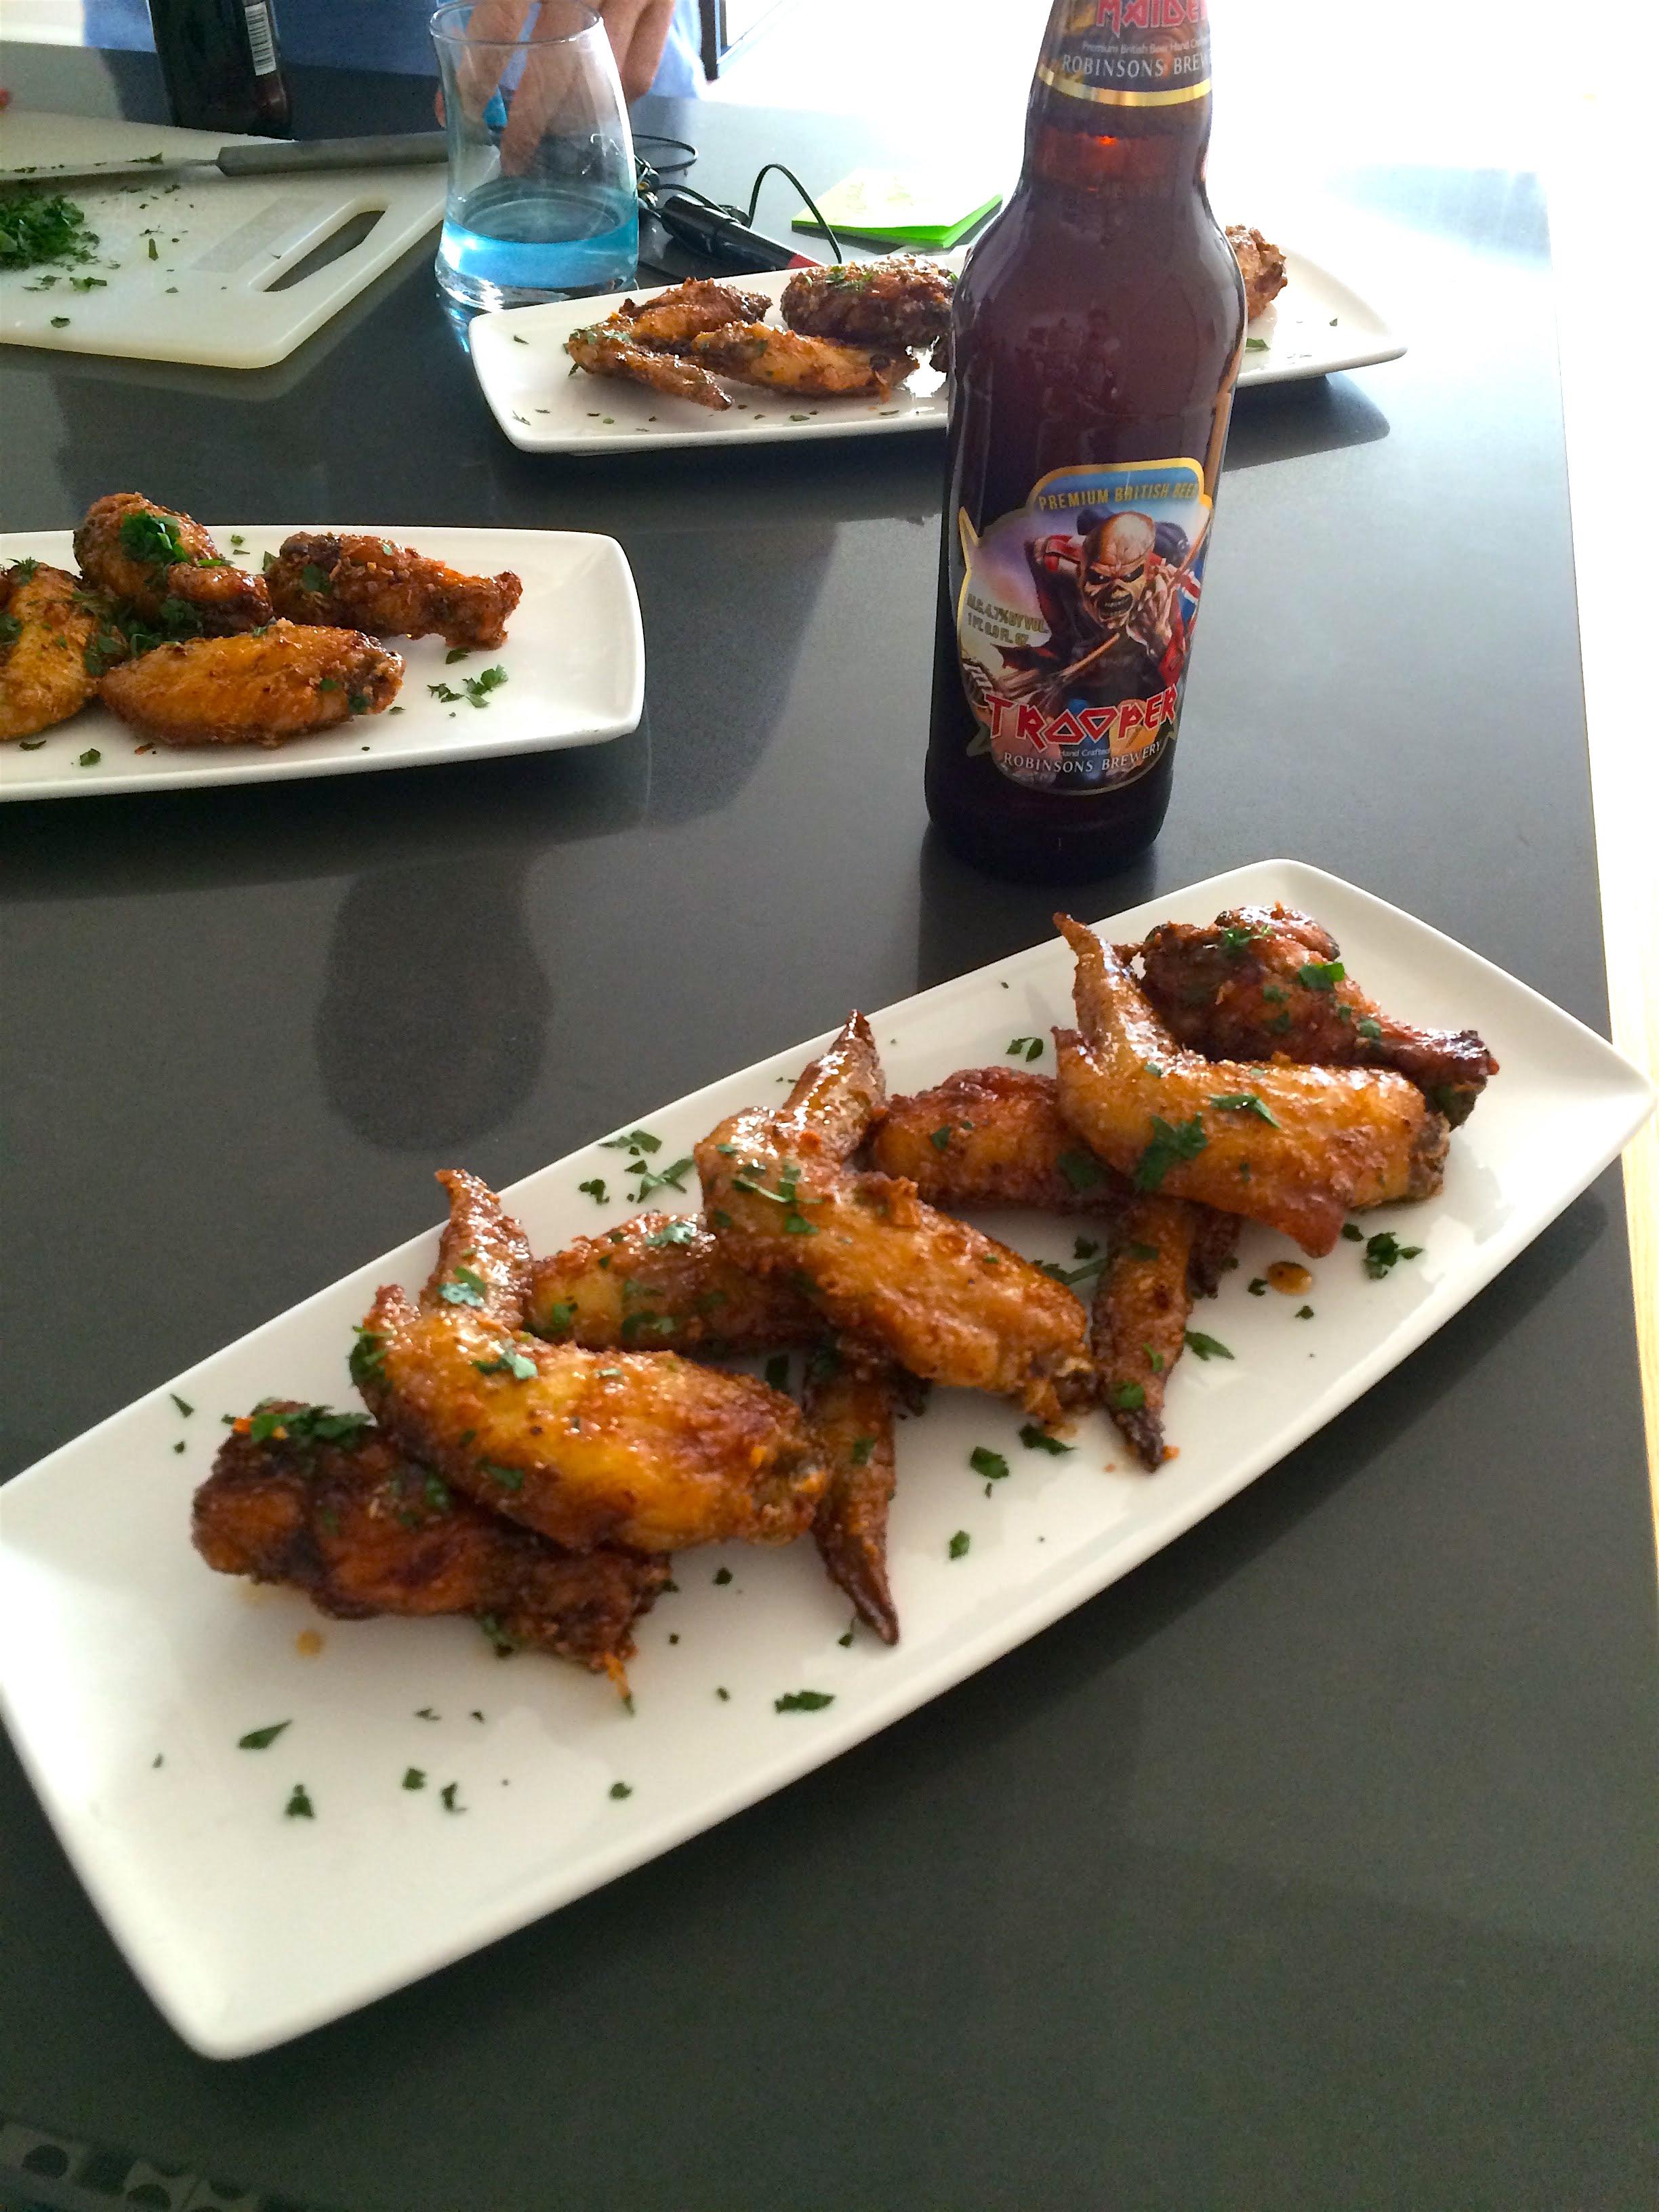 Vietnamese fish sauce wings pok pok wings p t smith for Fish sauce ingredients